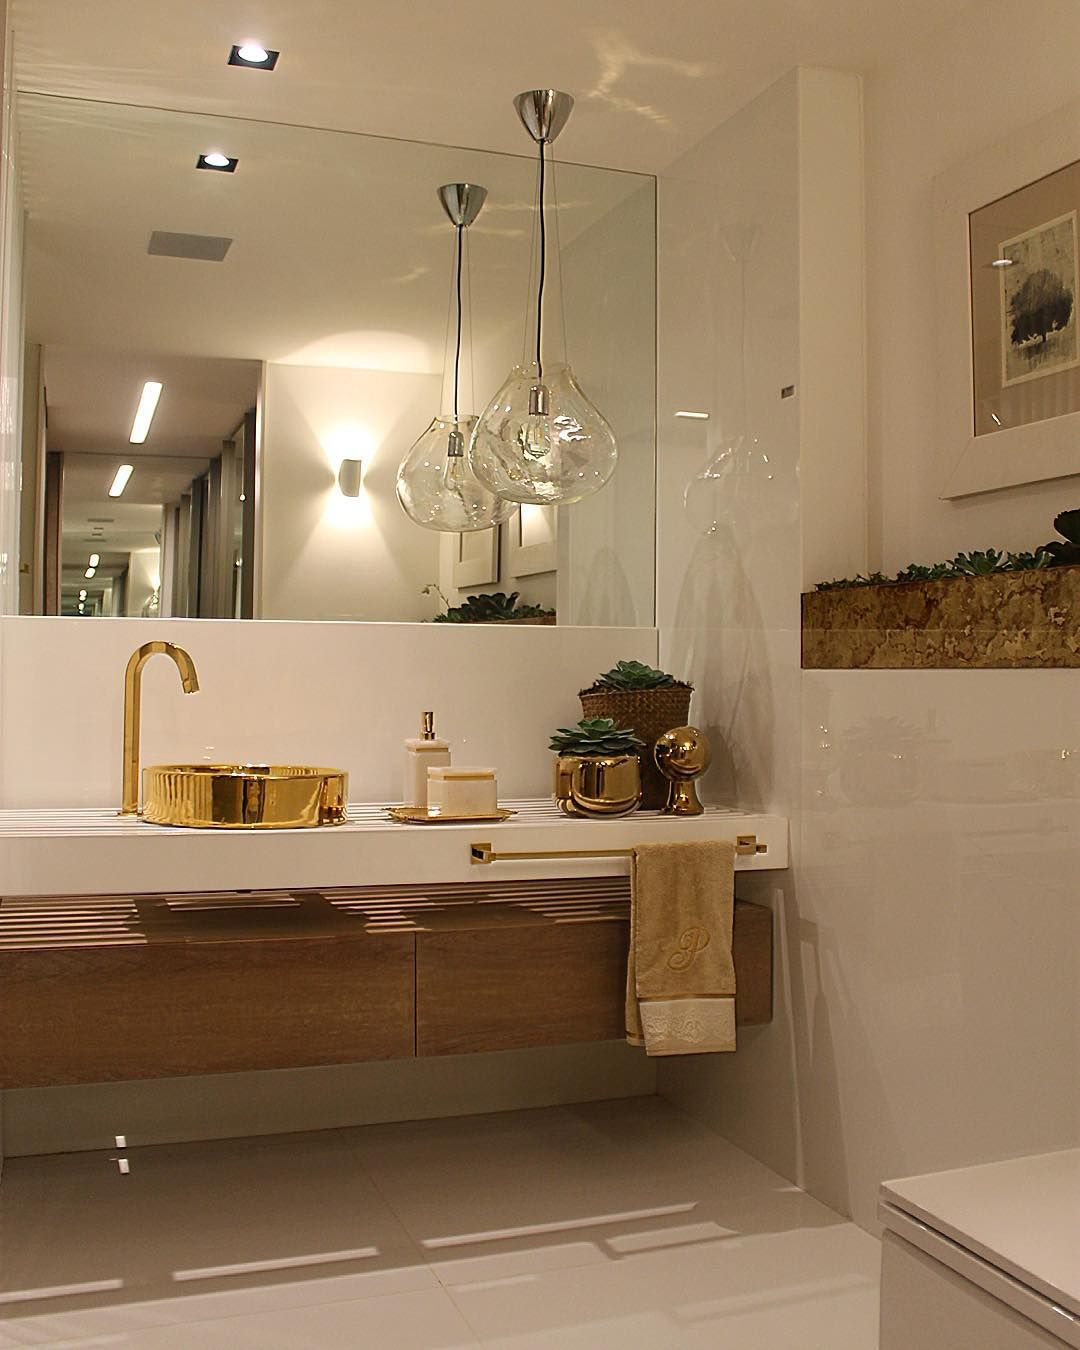 Casa Cor Brasília 2015 repare na Cuba e nos metais dourados (Deca) no banhei -> Cuba Para Banheiro Pequeno